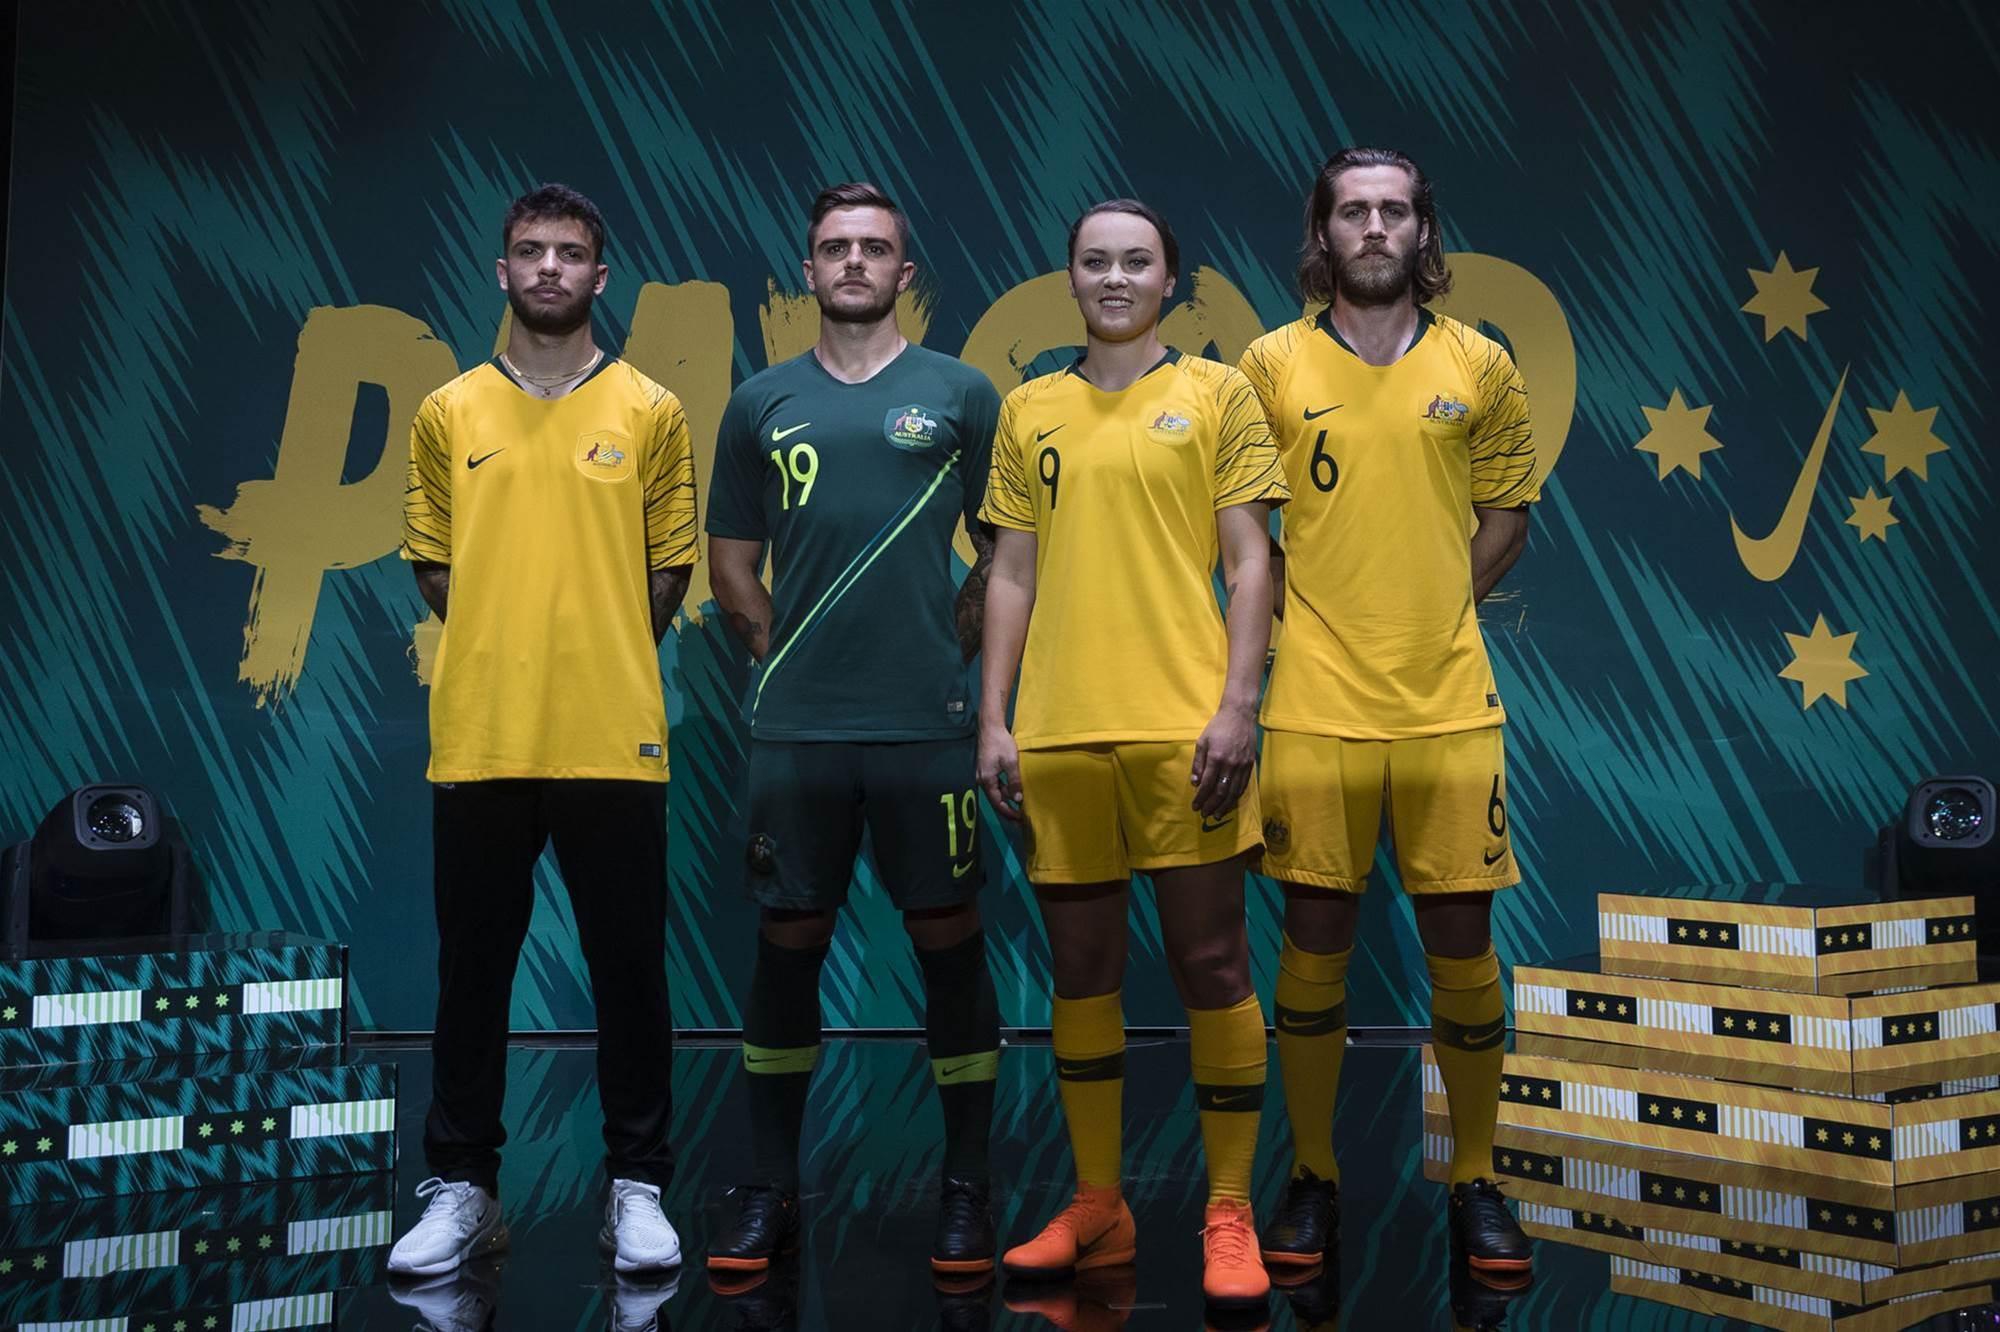 Socceroos and Matildas kit reveal